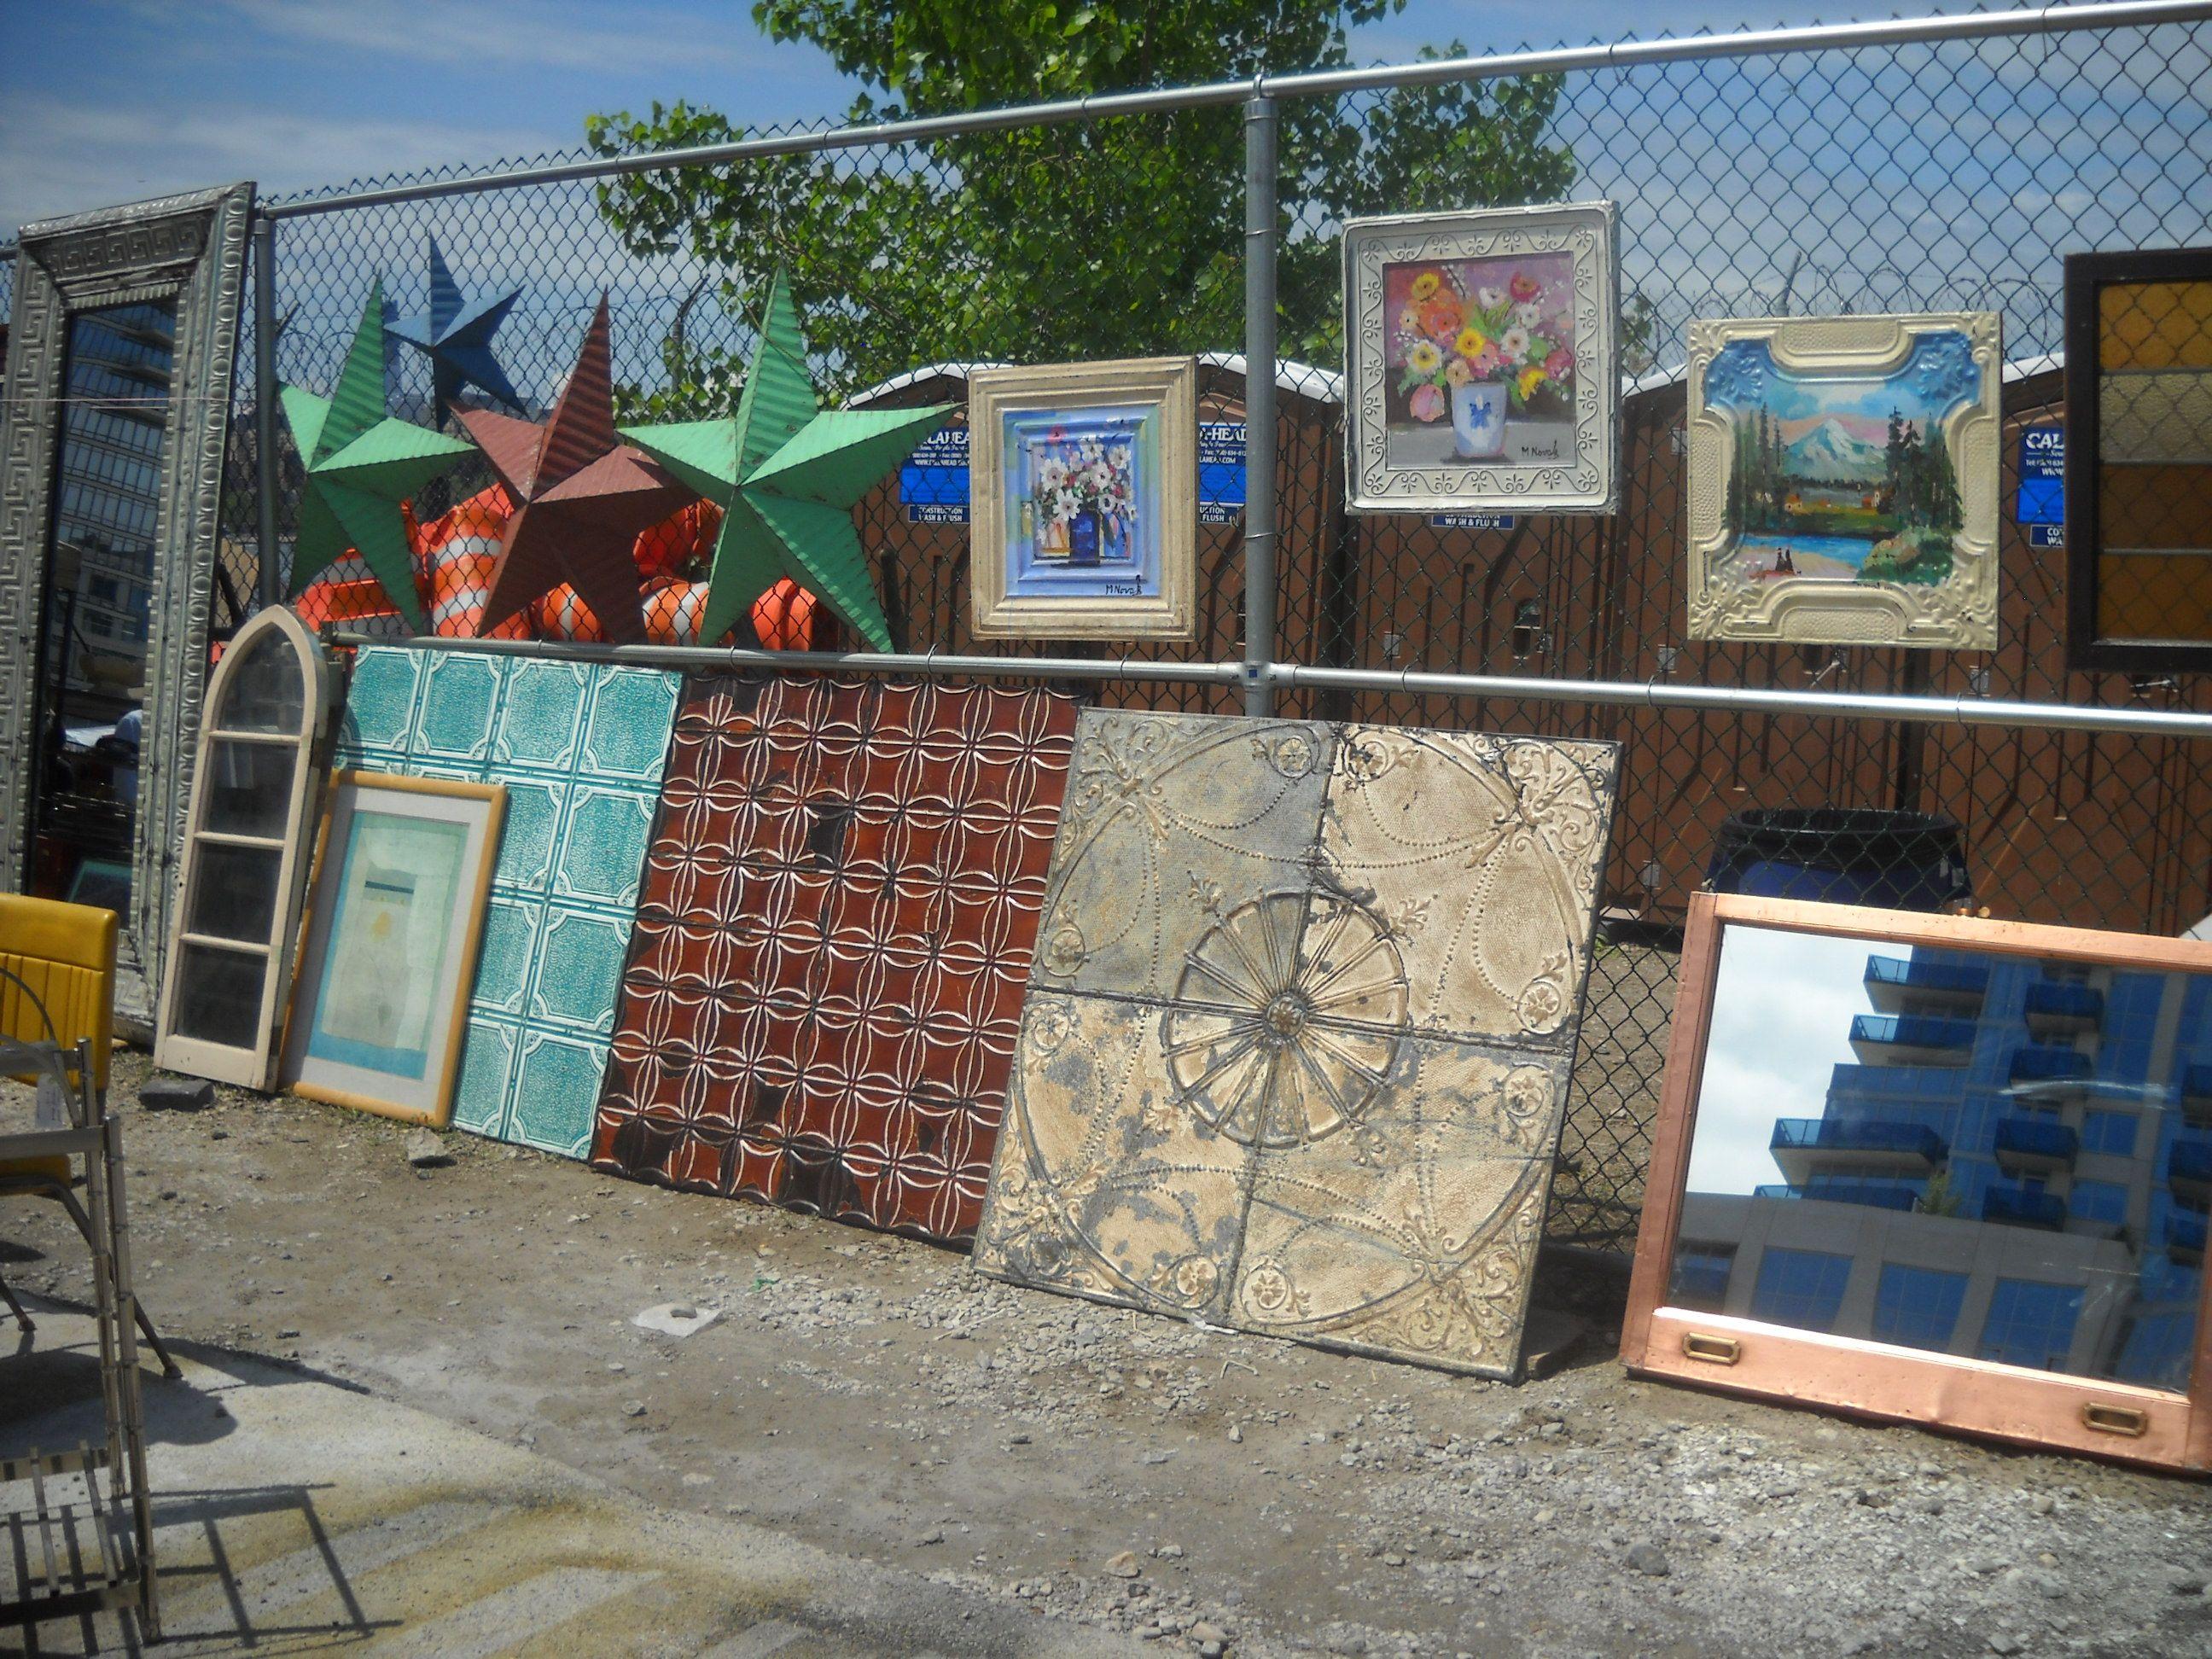 Flea Market tiles Fleas, Brooklyn flea market, Brooklyn flea